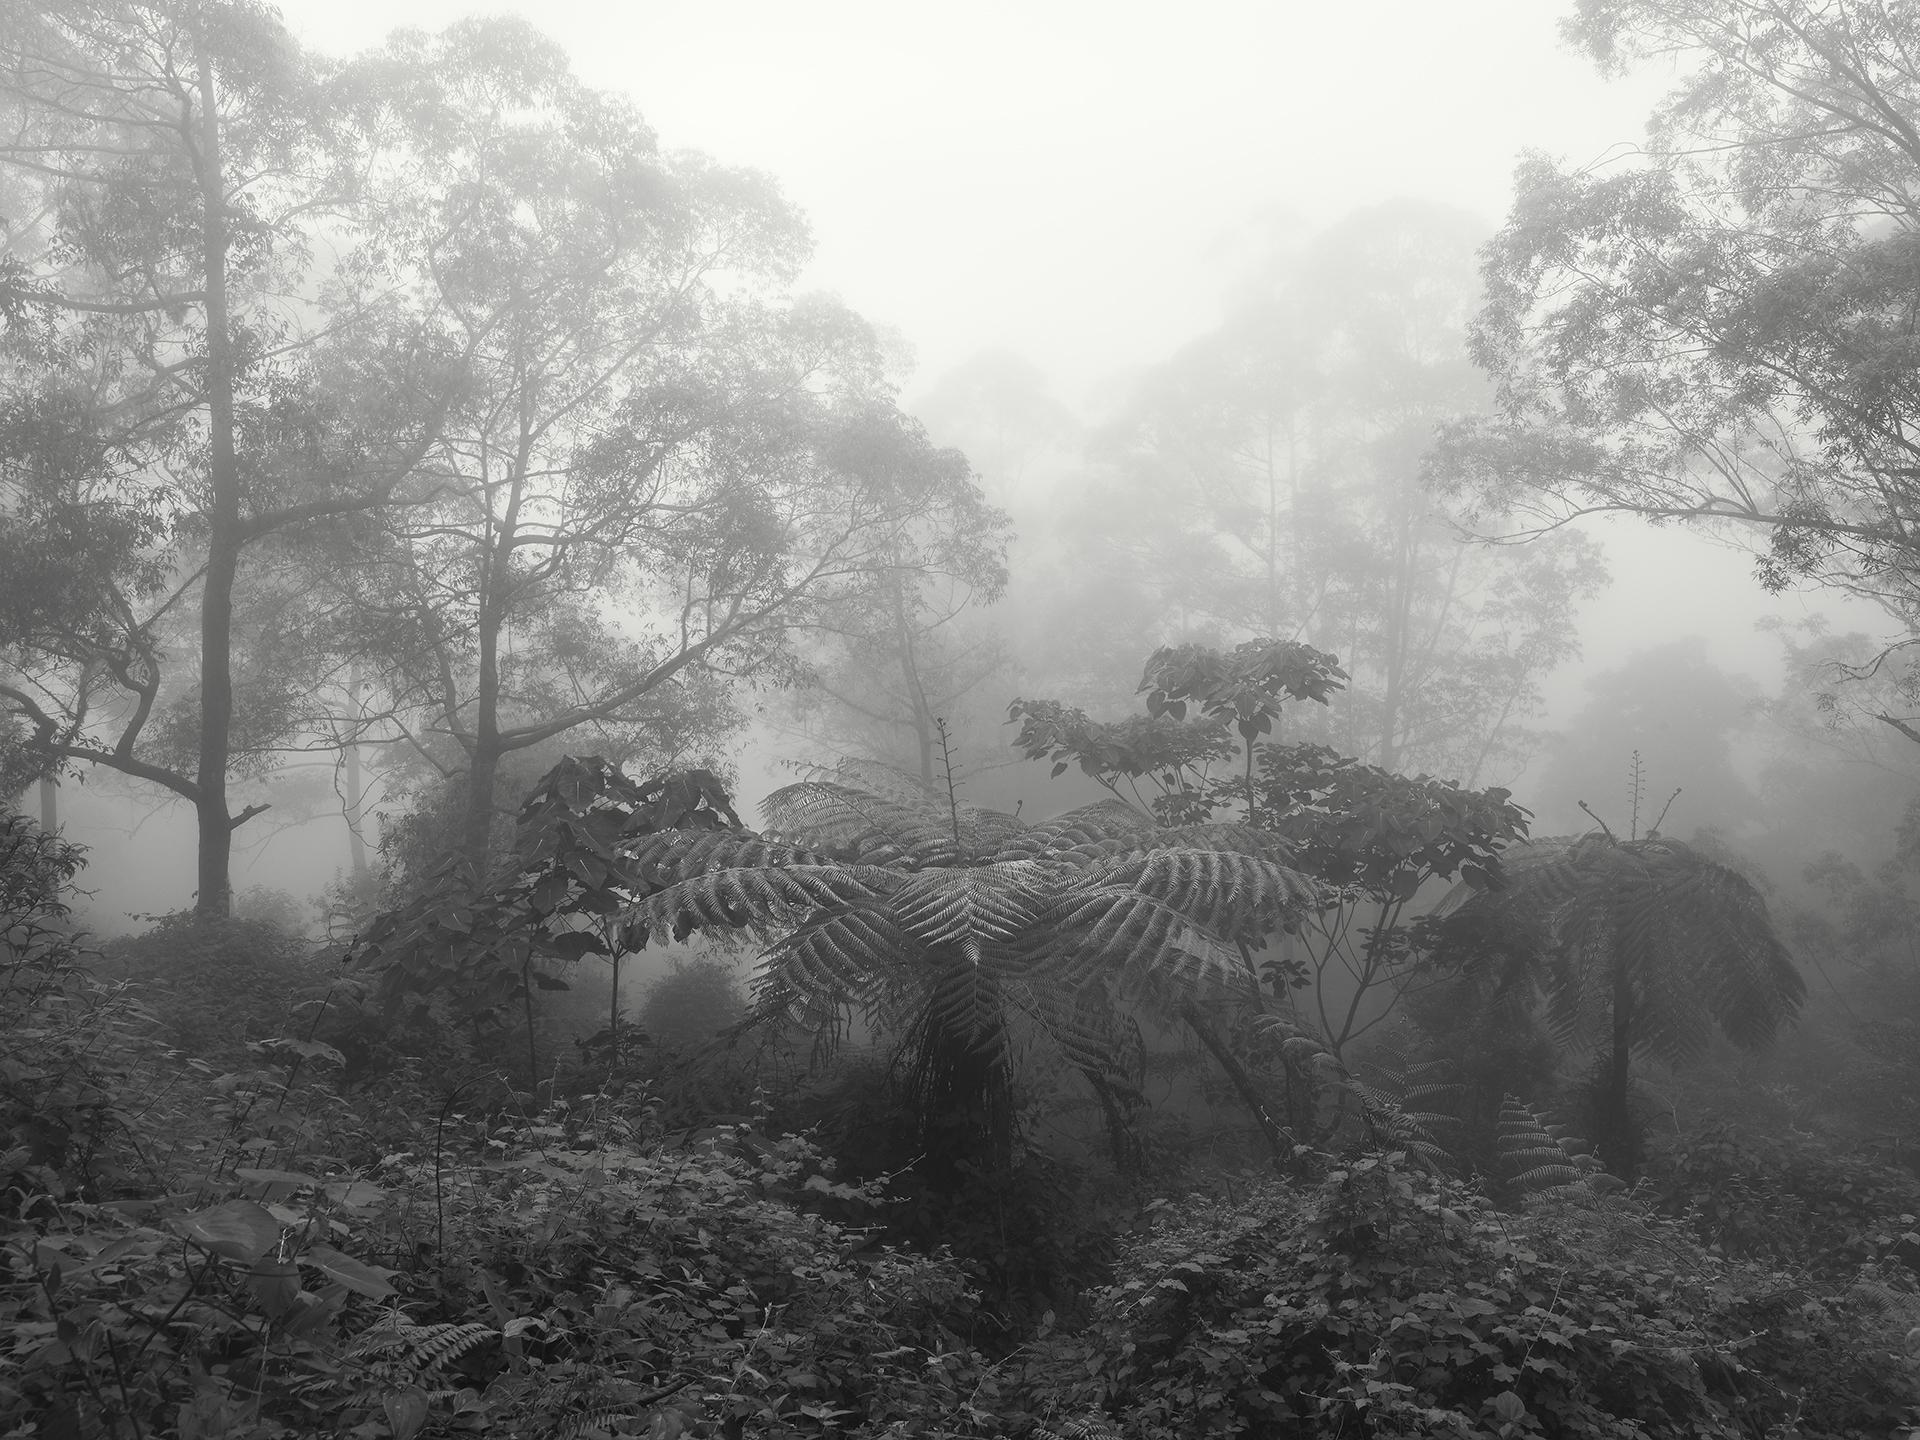 Large Fern, Bali - 2010 copy.jpg